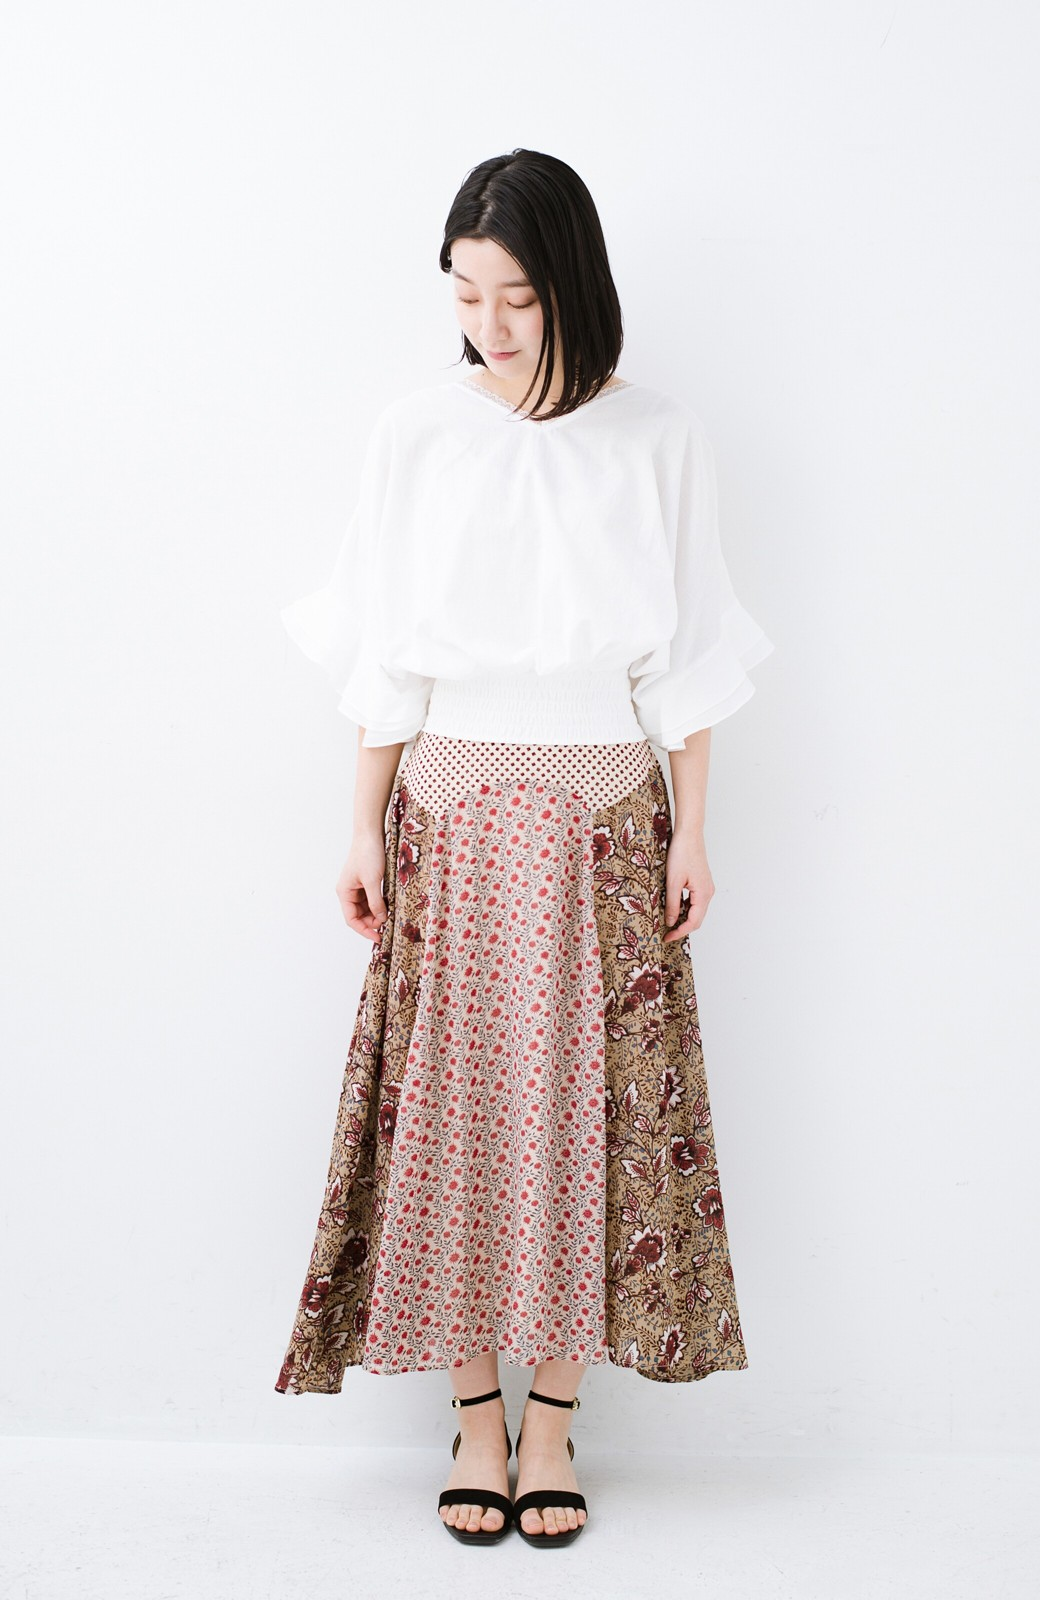 haco! 【洗濯機洗いOK】シンプルなトップスに合わせるだけでかわいくなれる MIX柄スカート <ベージュ系その他>の商品写真16